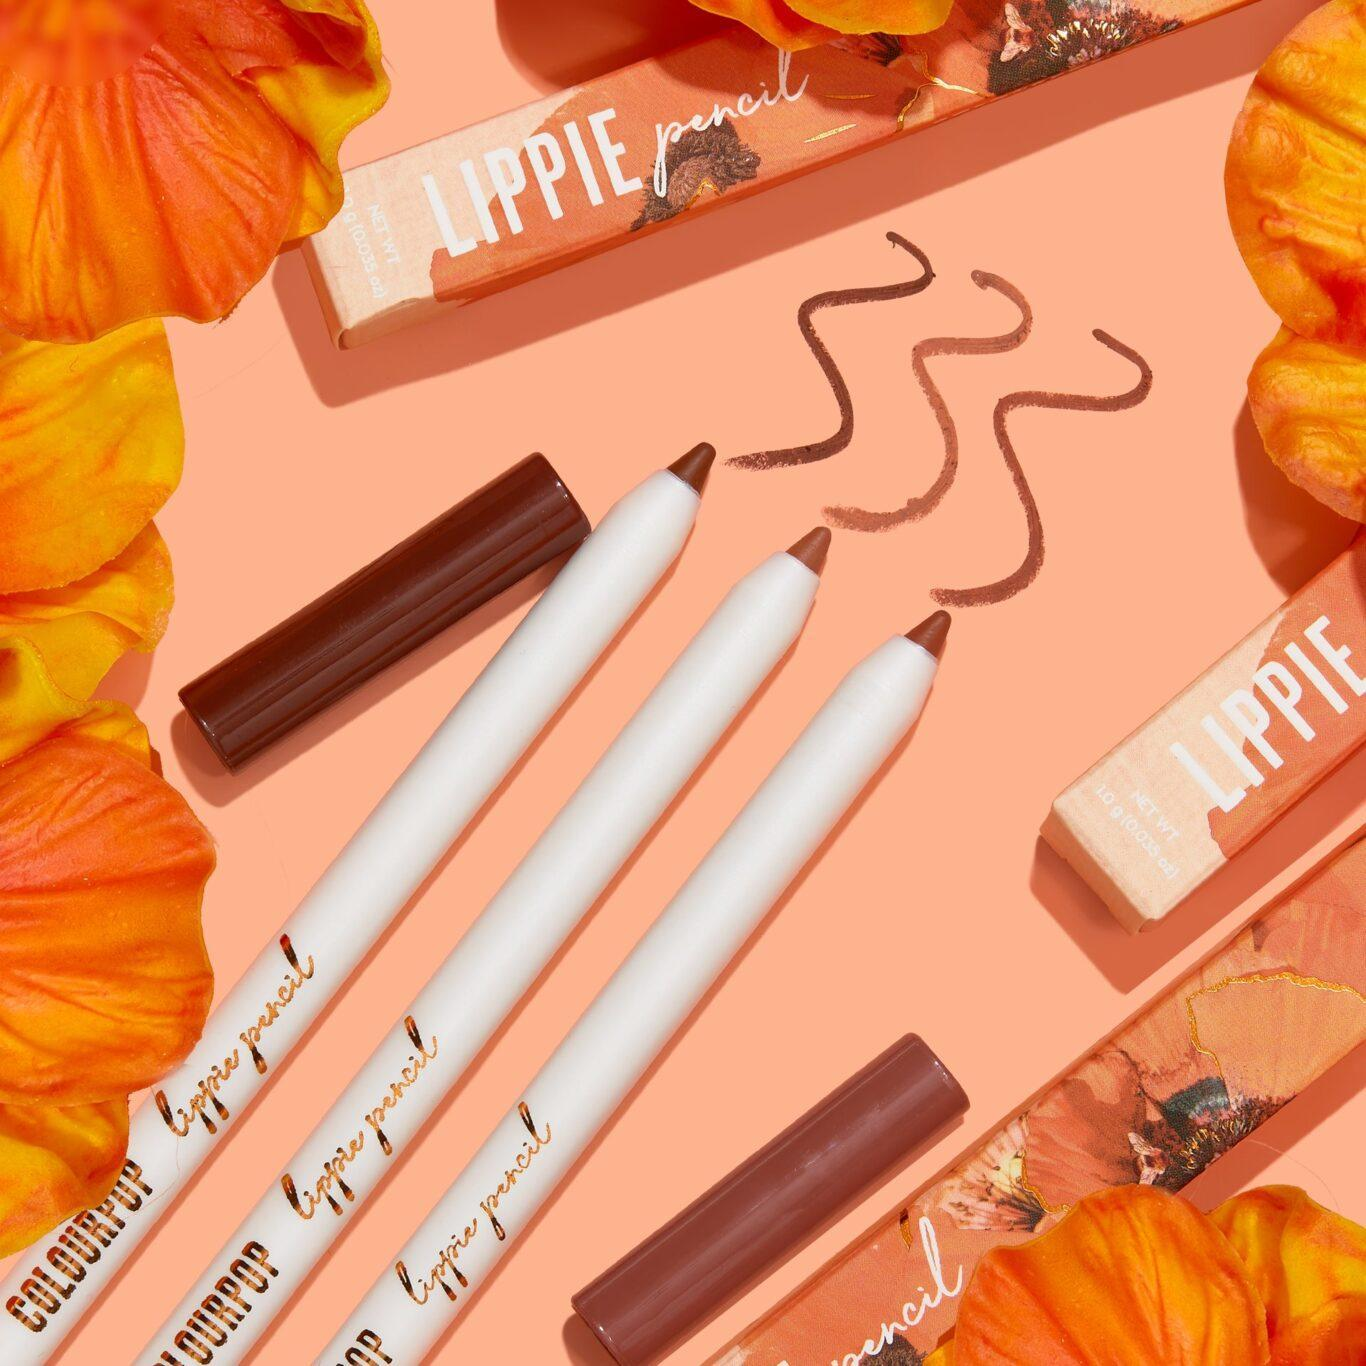 Colourpop Big Poppy Collection Lippie Pencils Promo